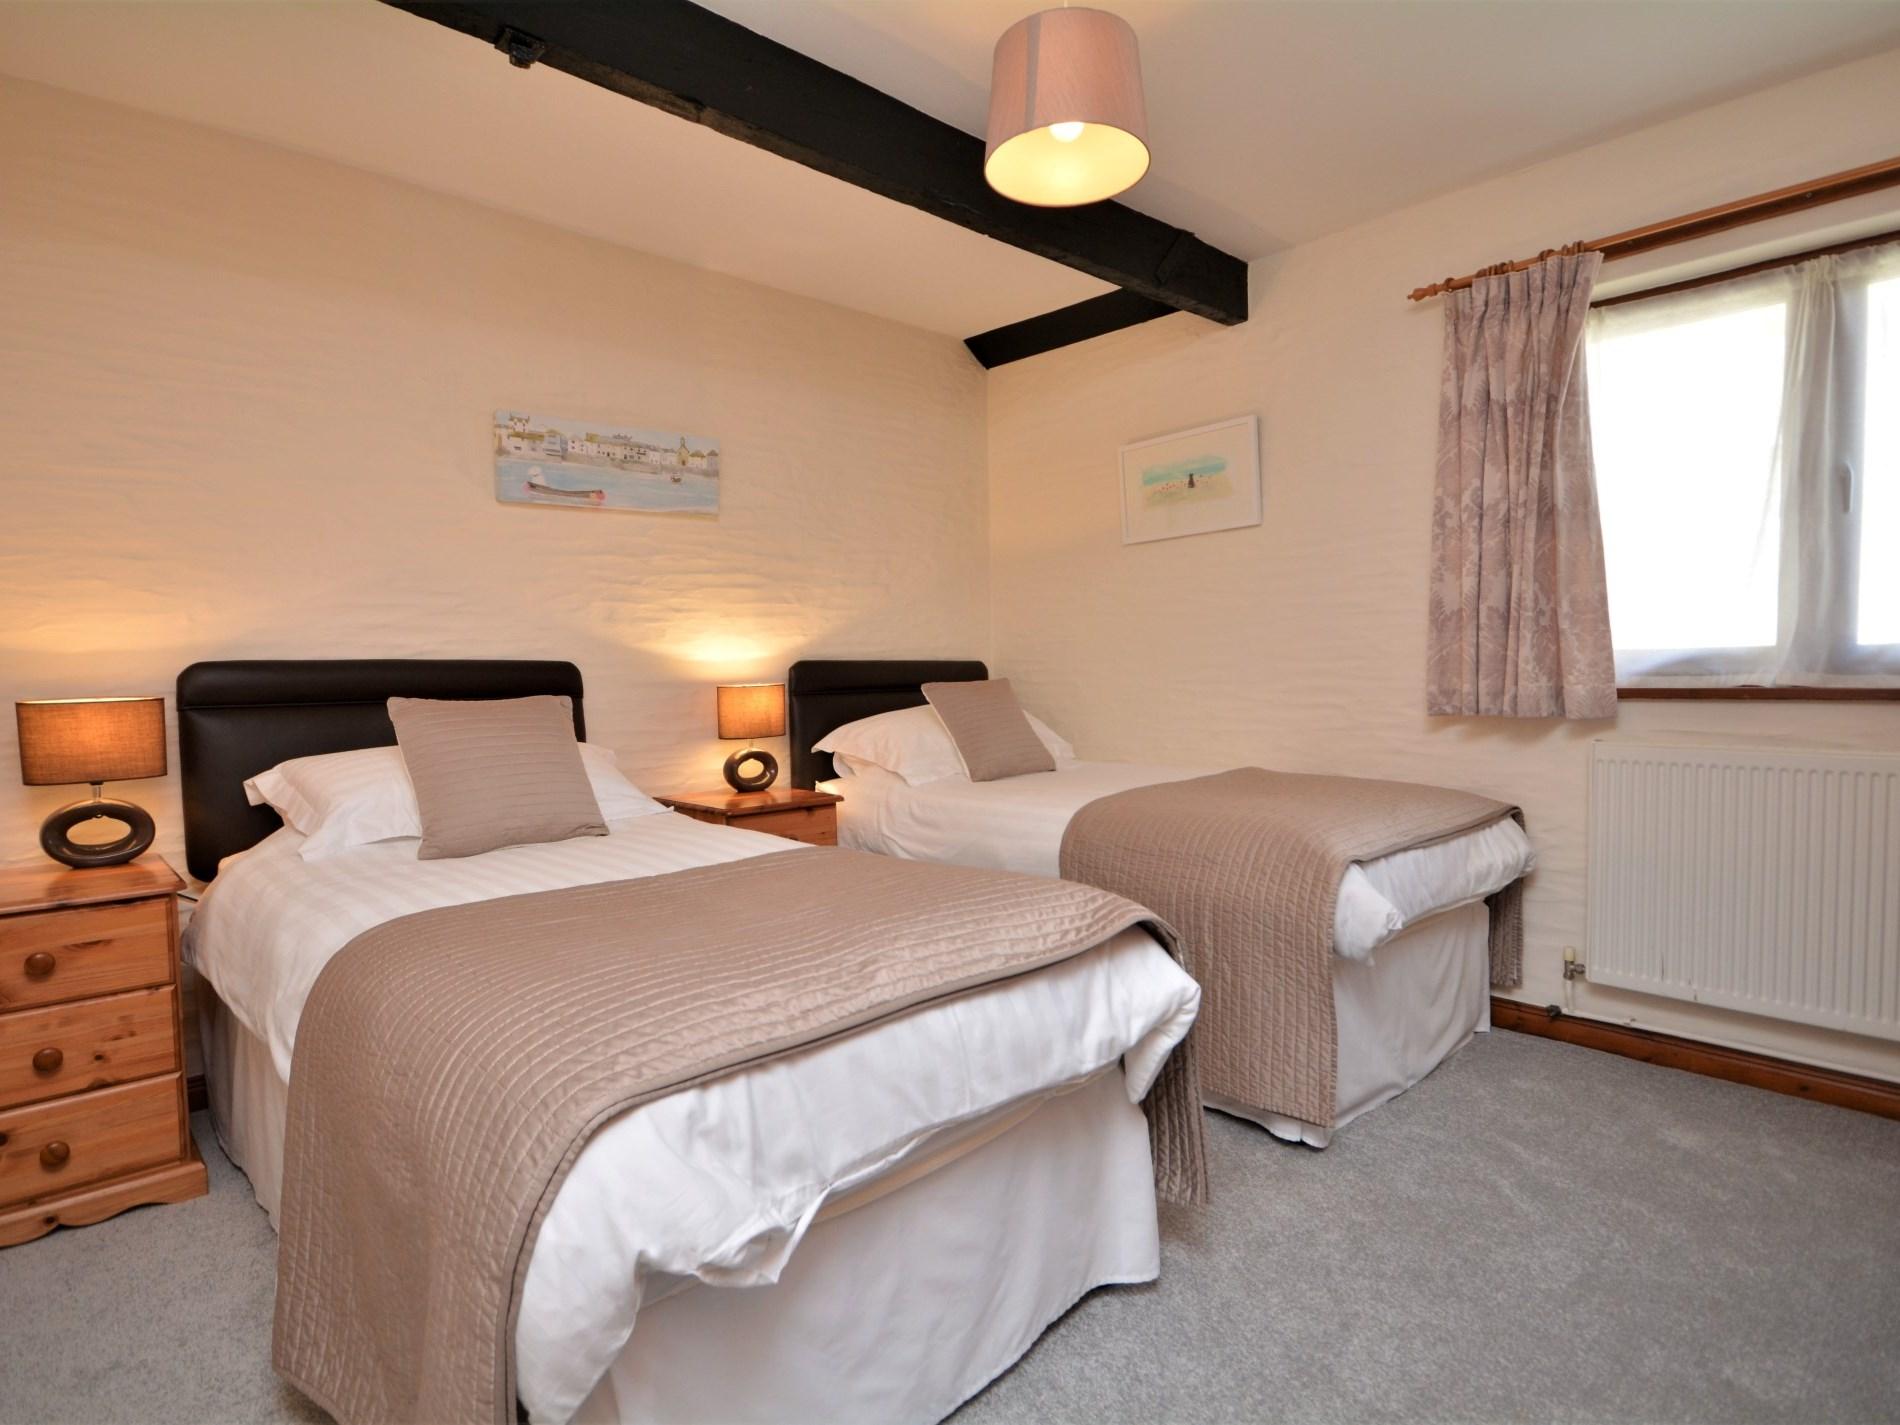 2 Bedroom Cottage in Looe, Cornwall